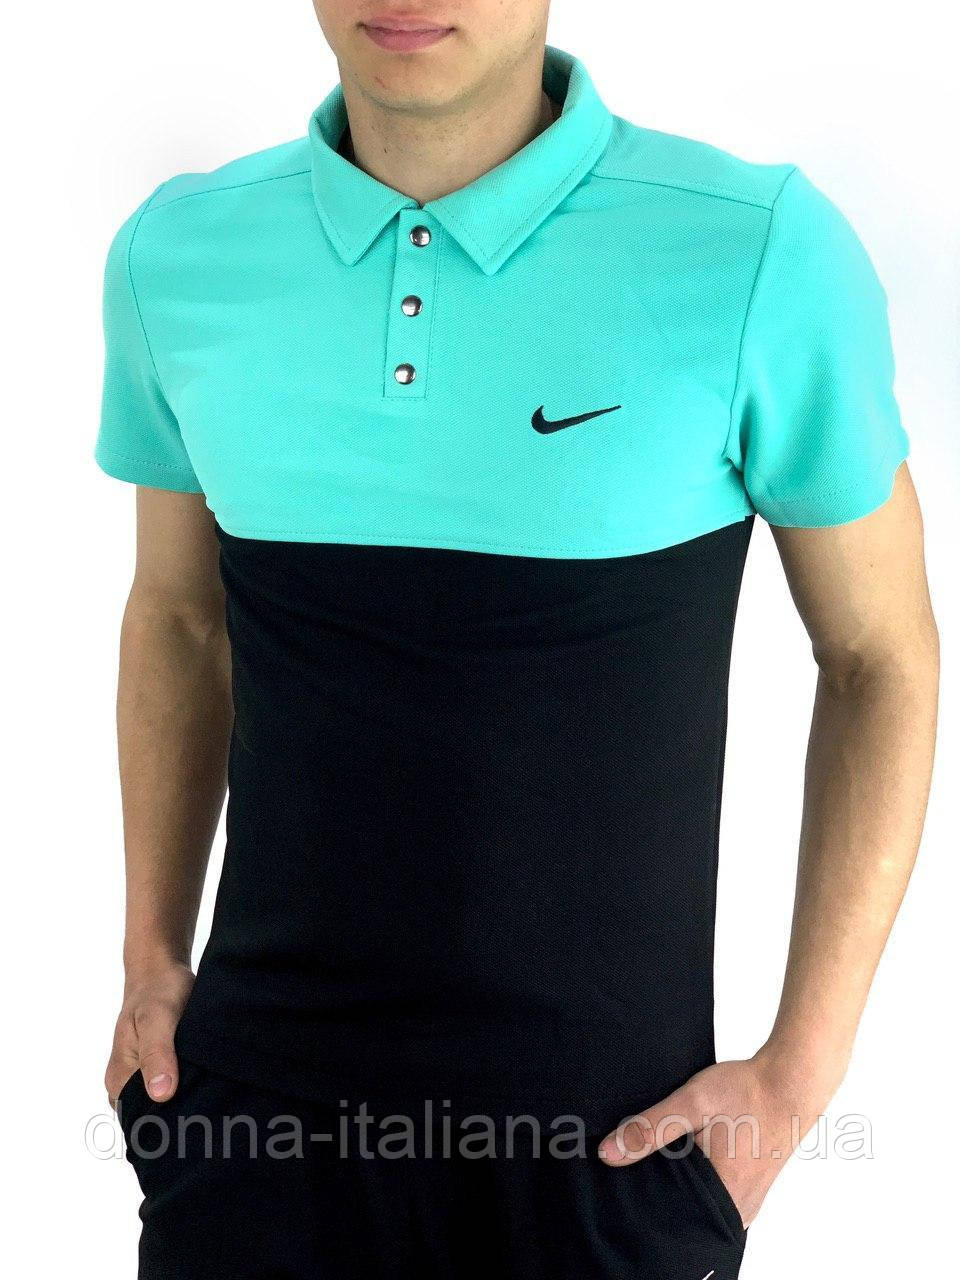 Футболка Polo Nike Реплика M Бирюзовый с черным (ФП-012-002)